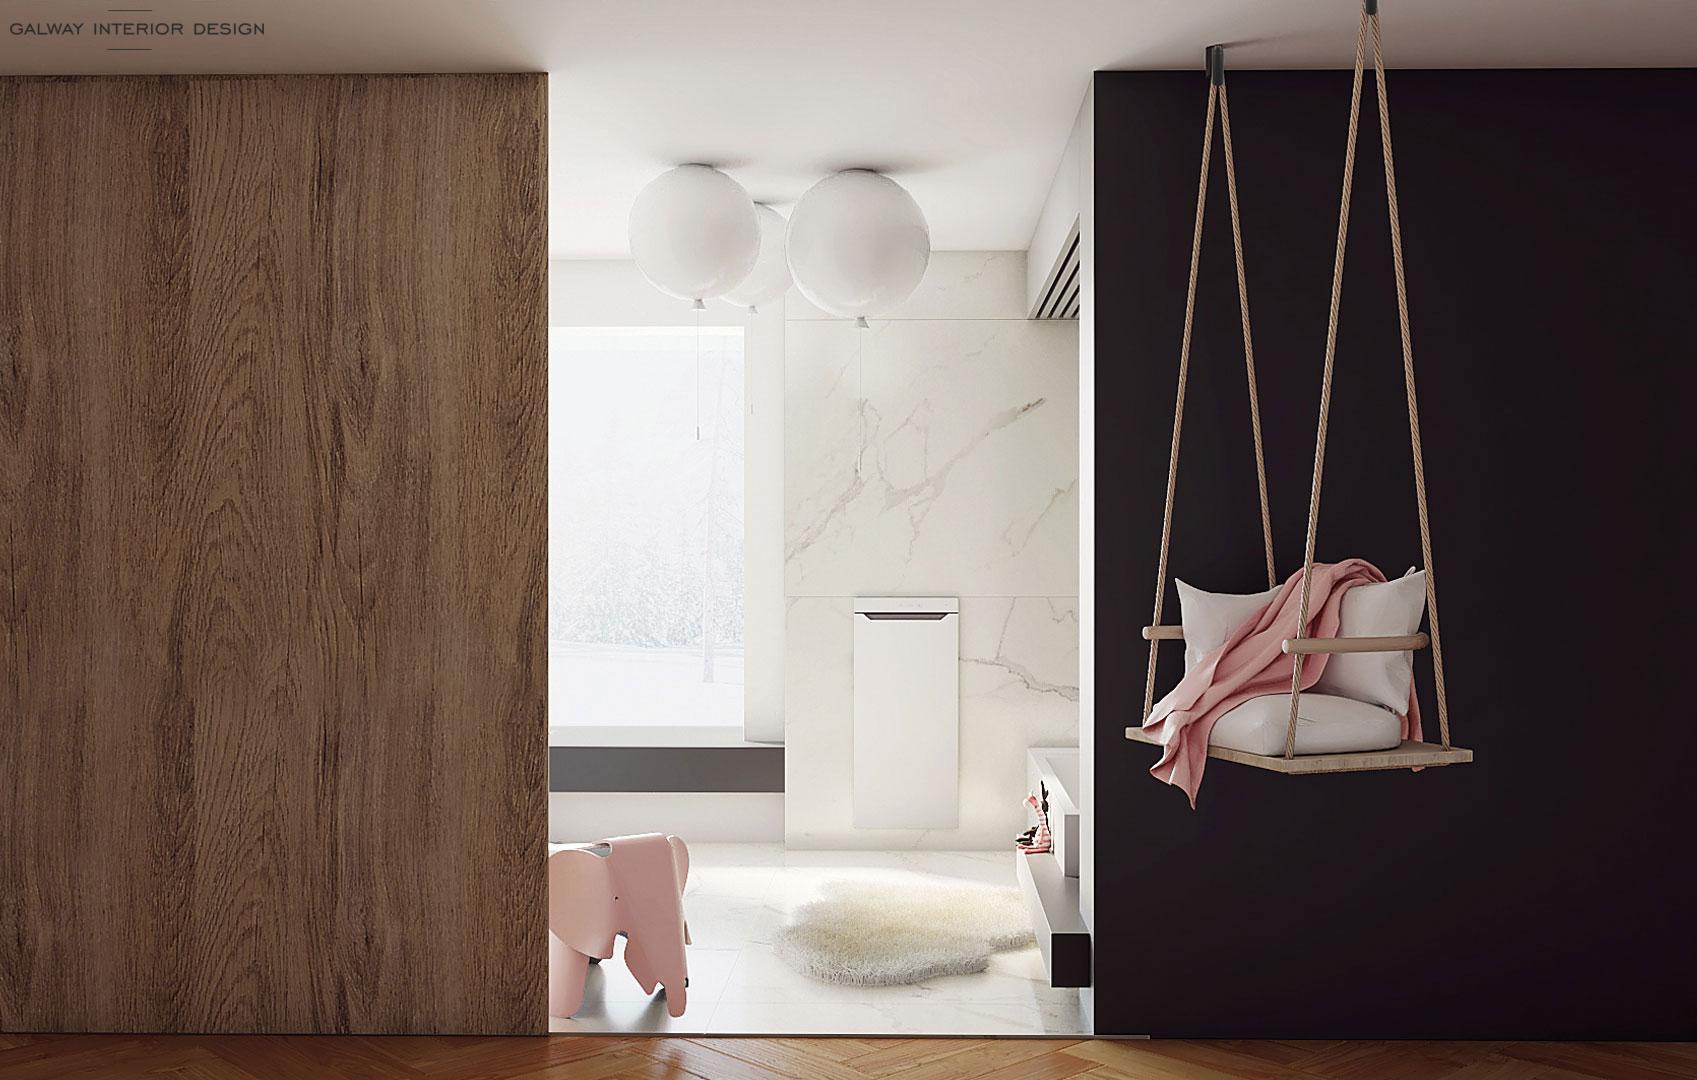 Galway Interior Design Kids Bathroom Idea 1